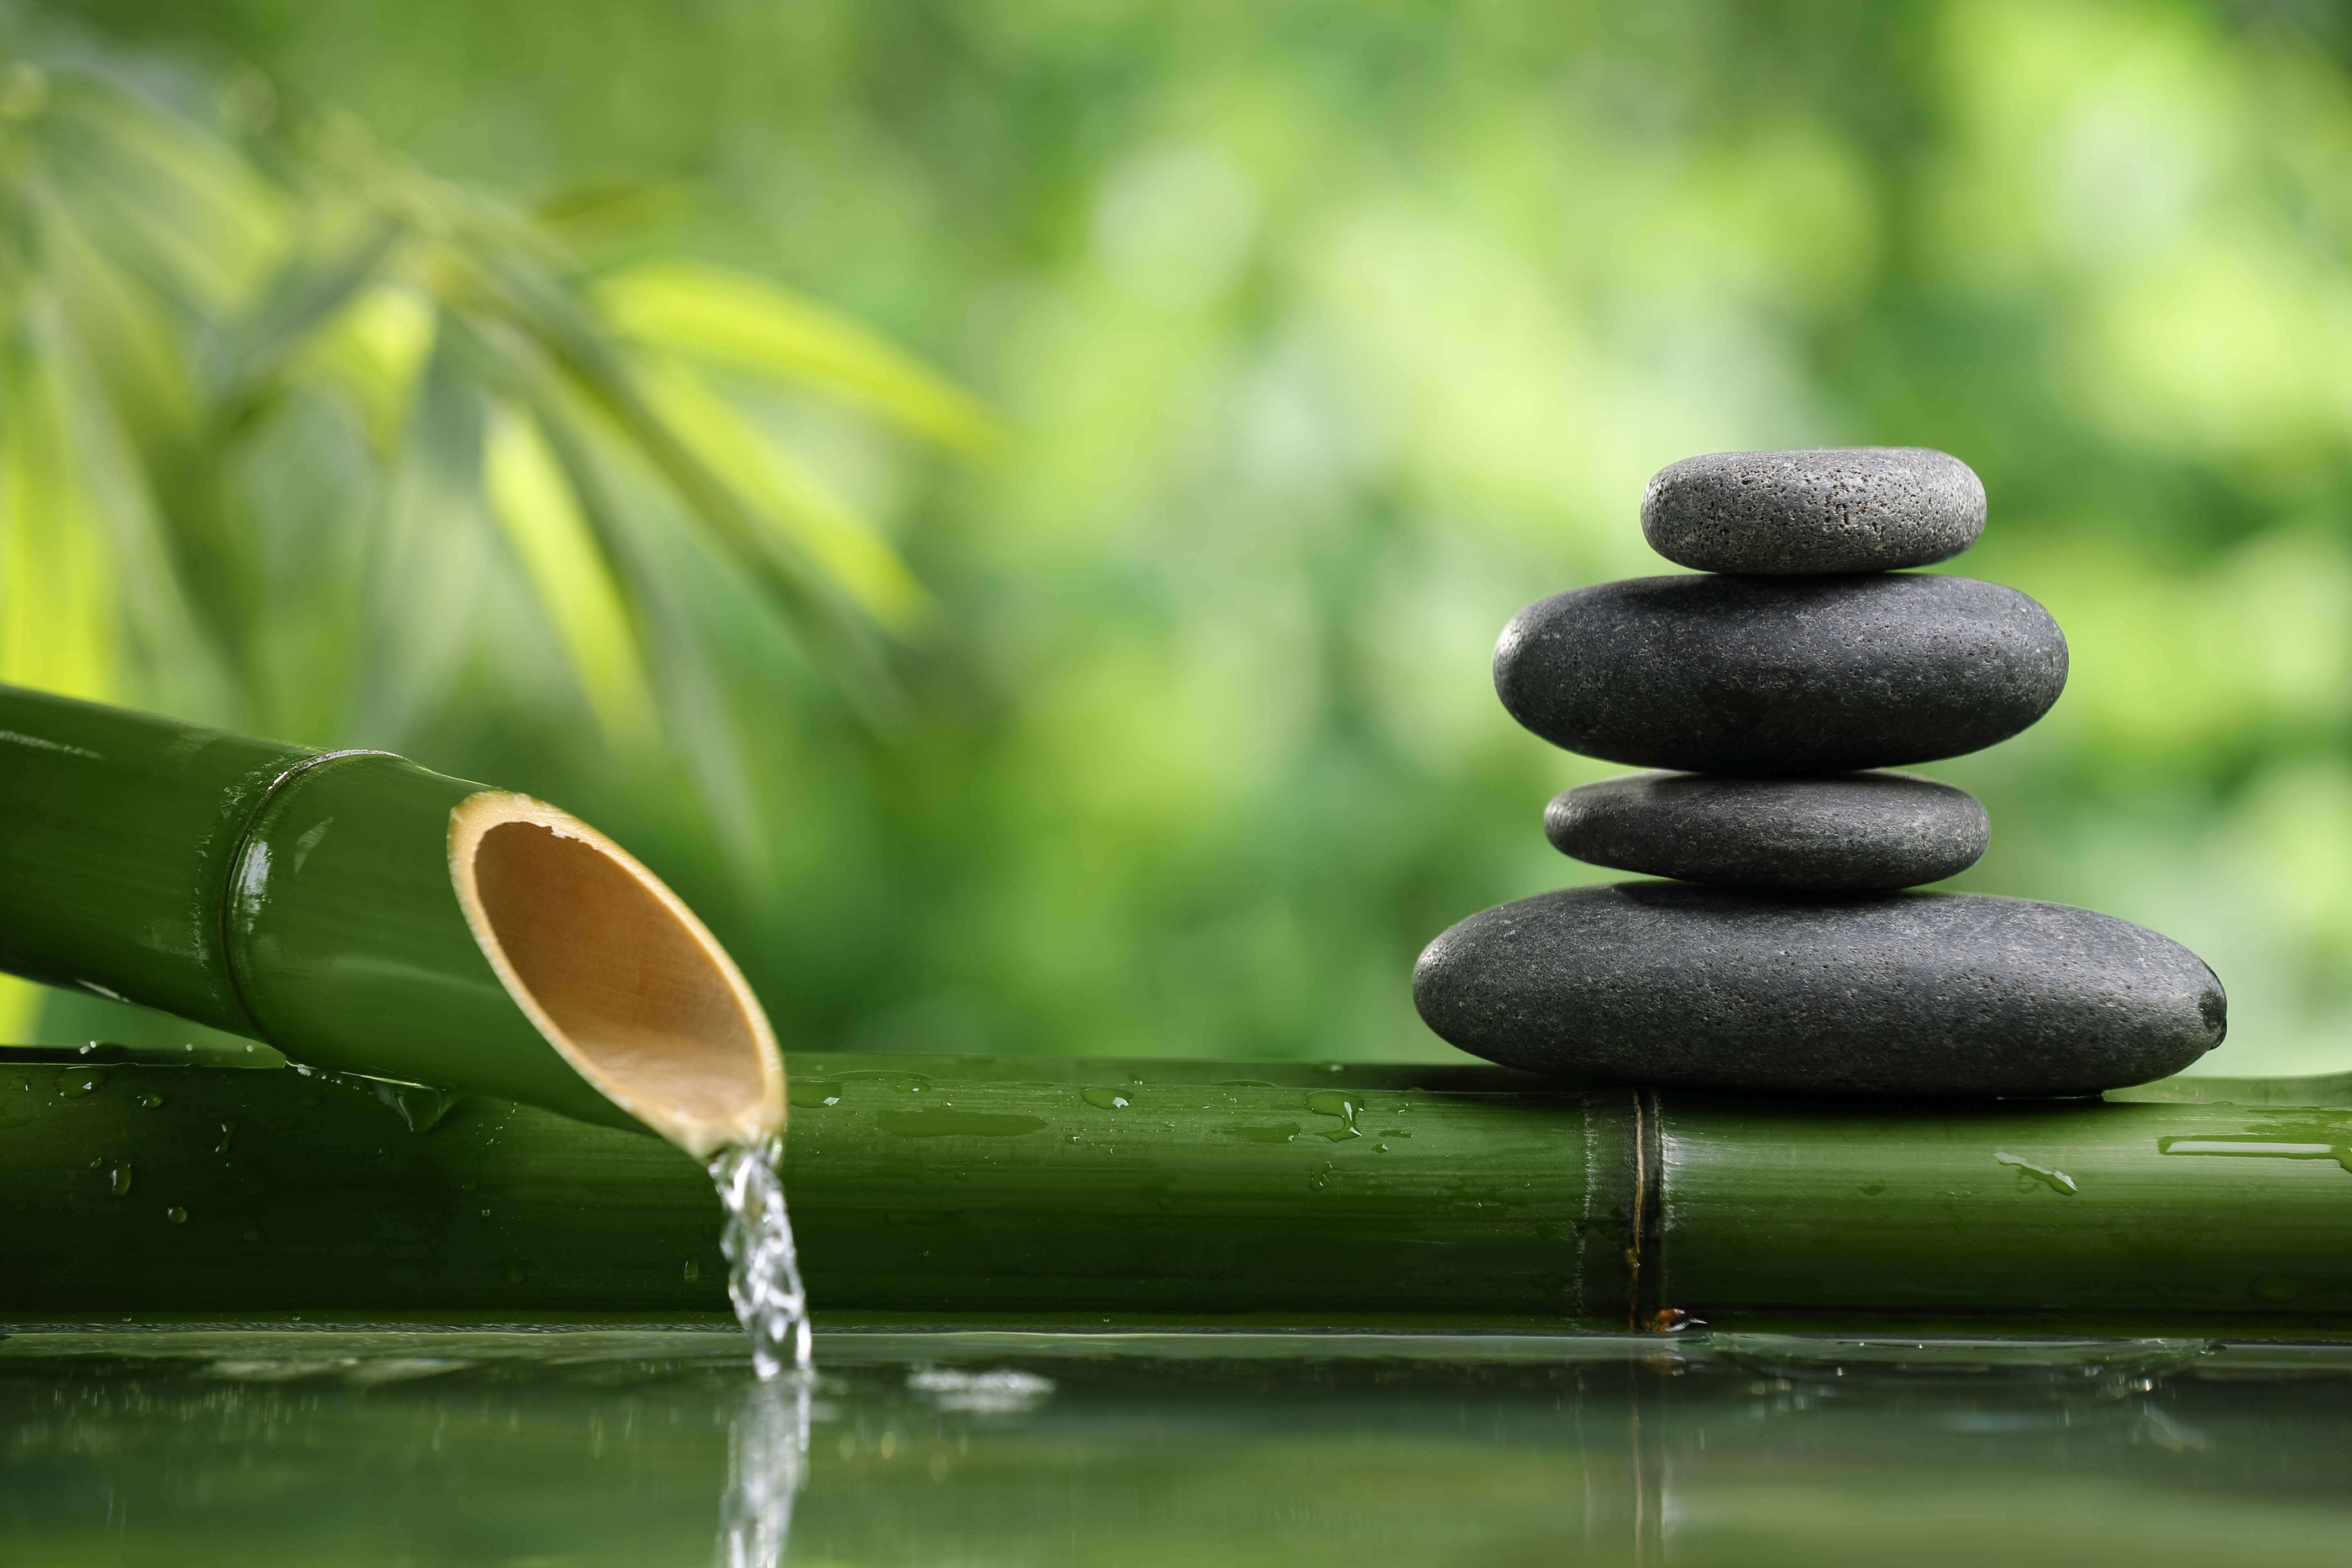 zen como fondos de pantalla Images for relaxing zen like wallpapers 2800x1867